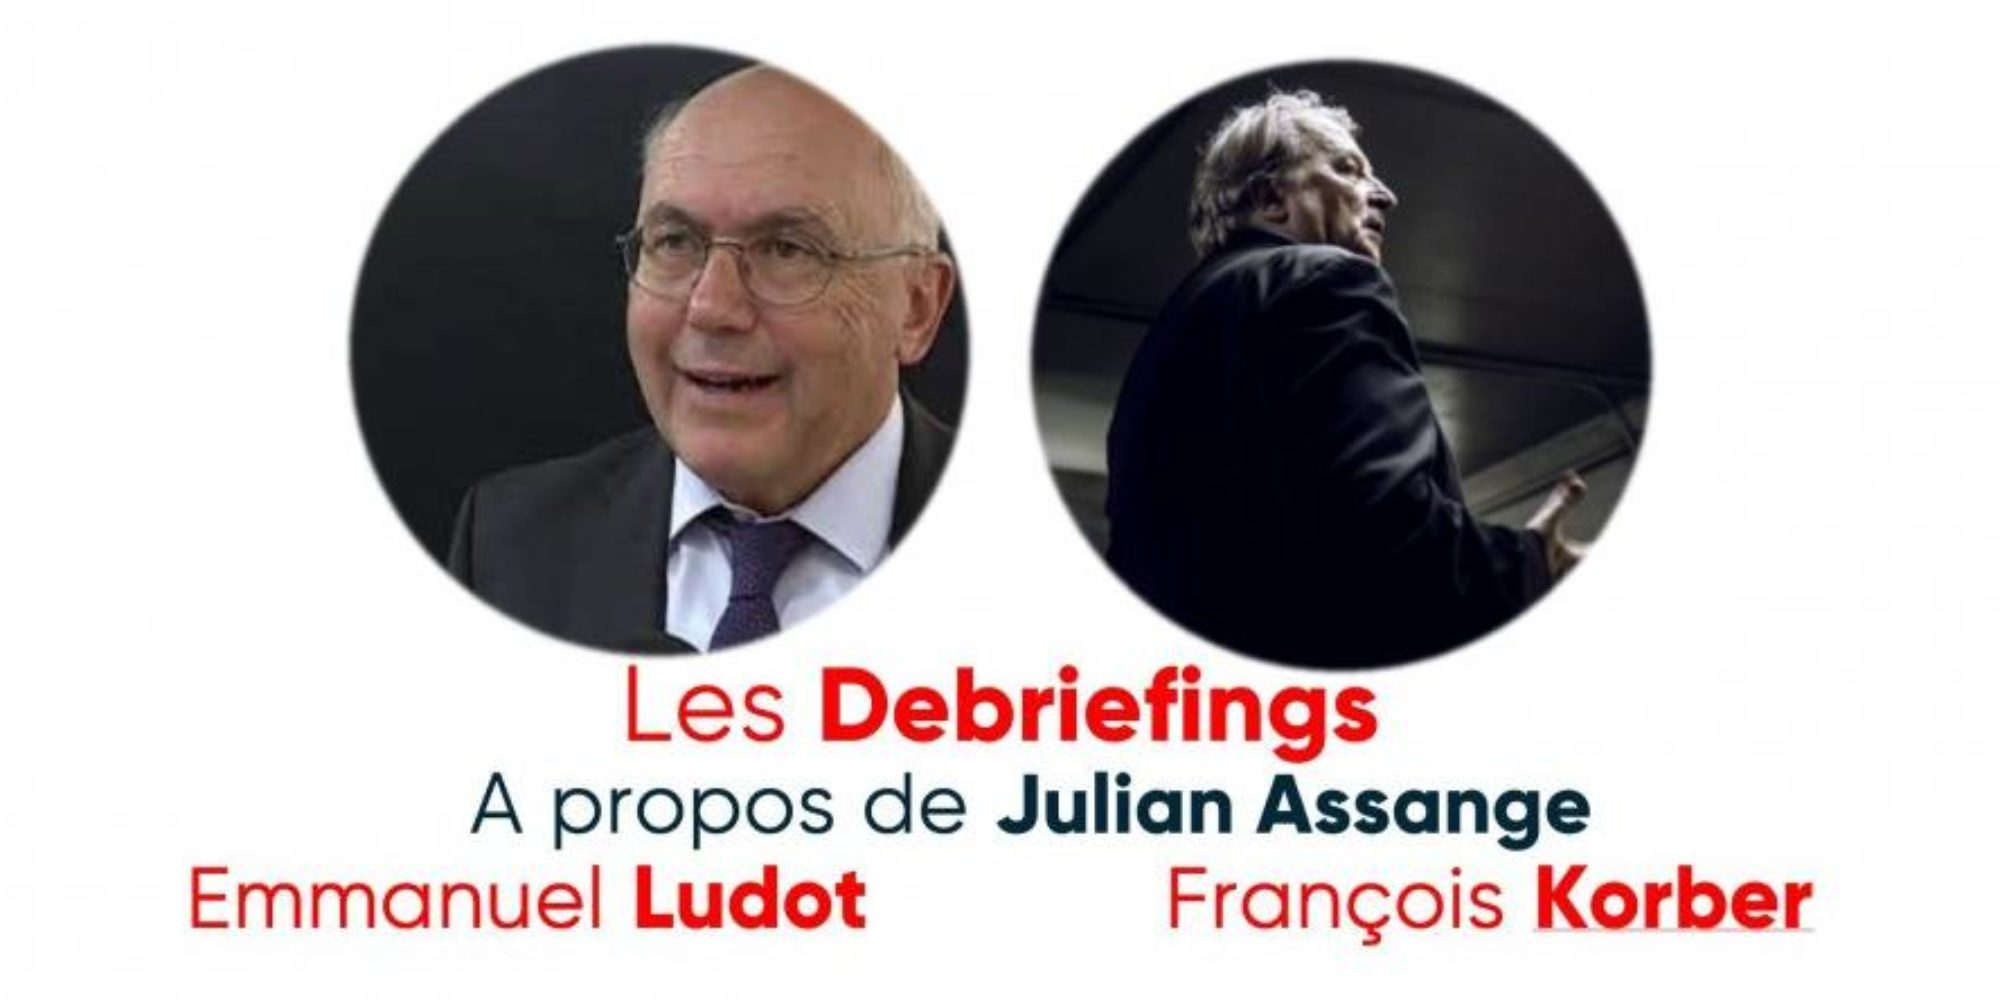 emmanuel_ludot_francois_kerber